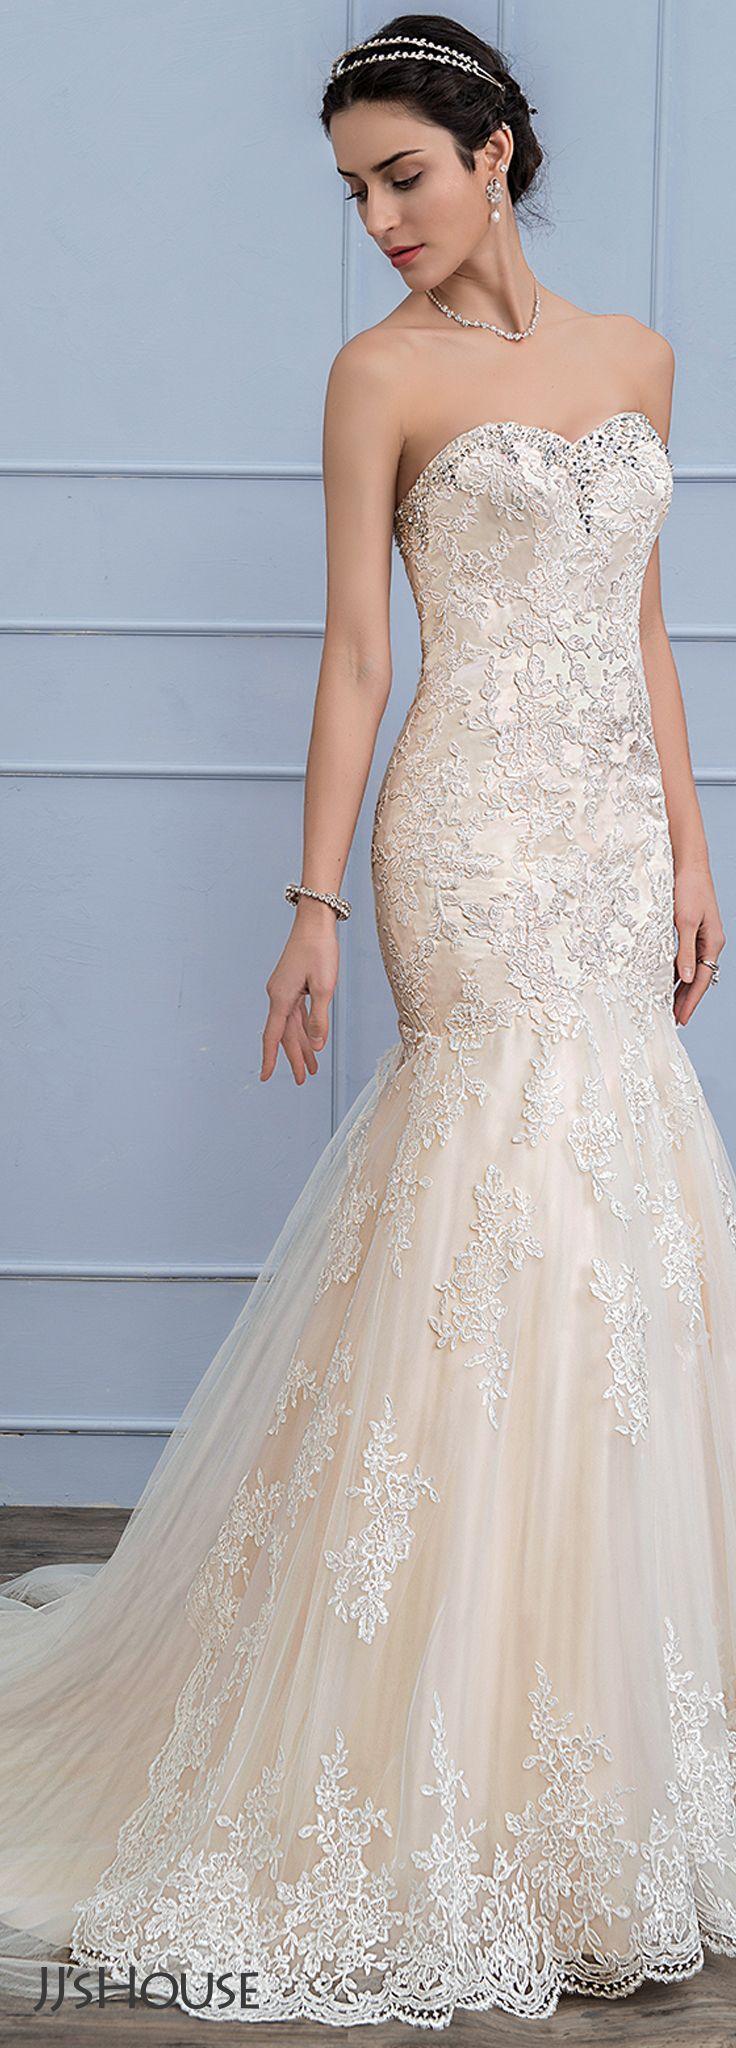 Dress Jjshouse Wedding Dresses 2779131 Weddbook